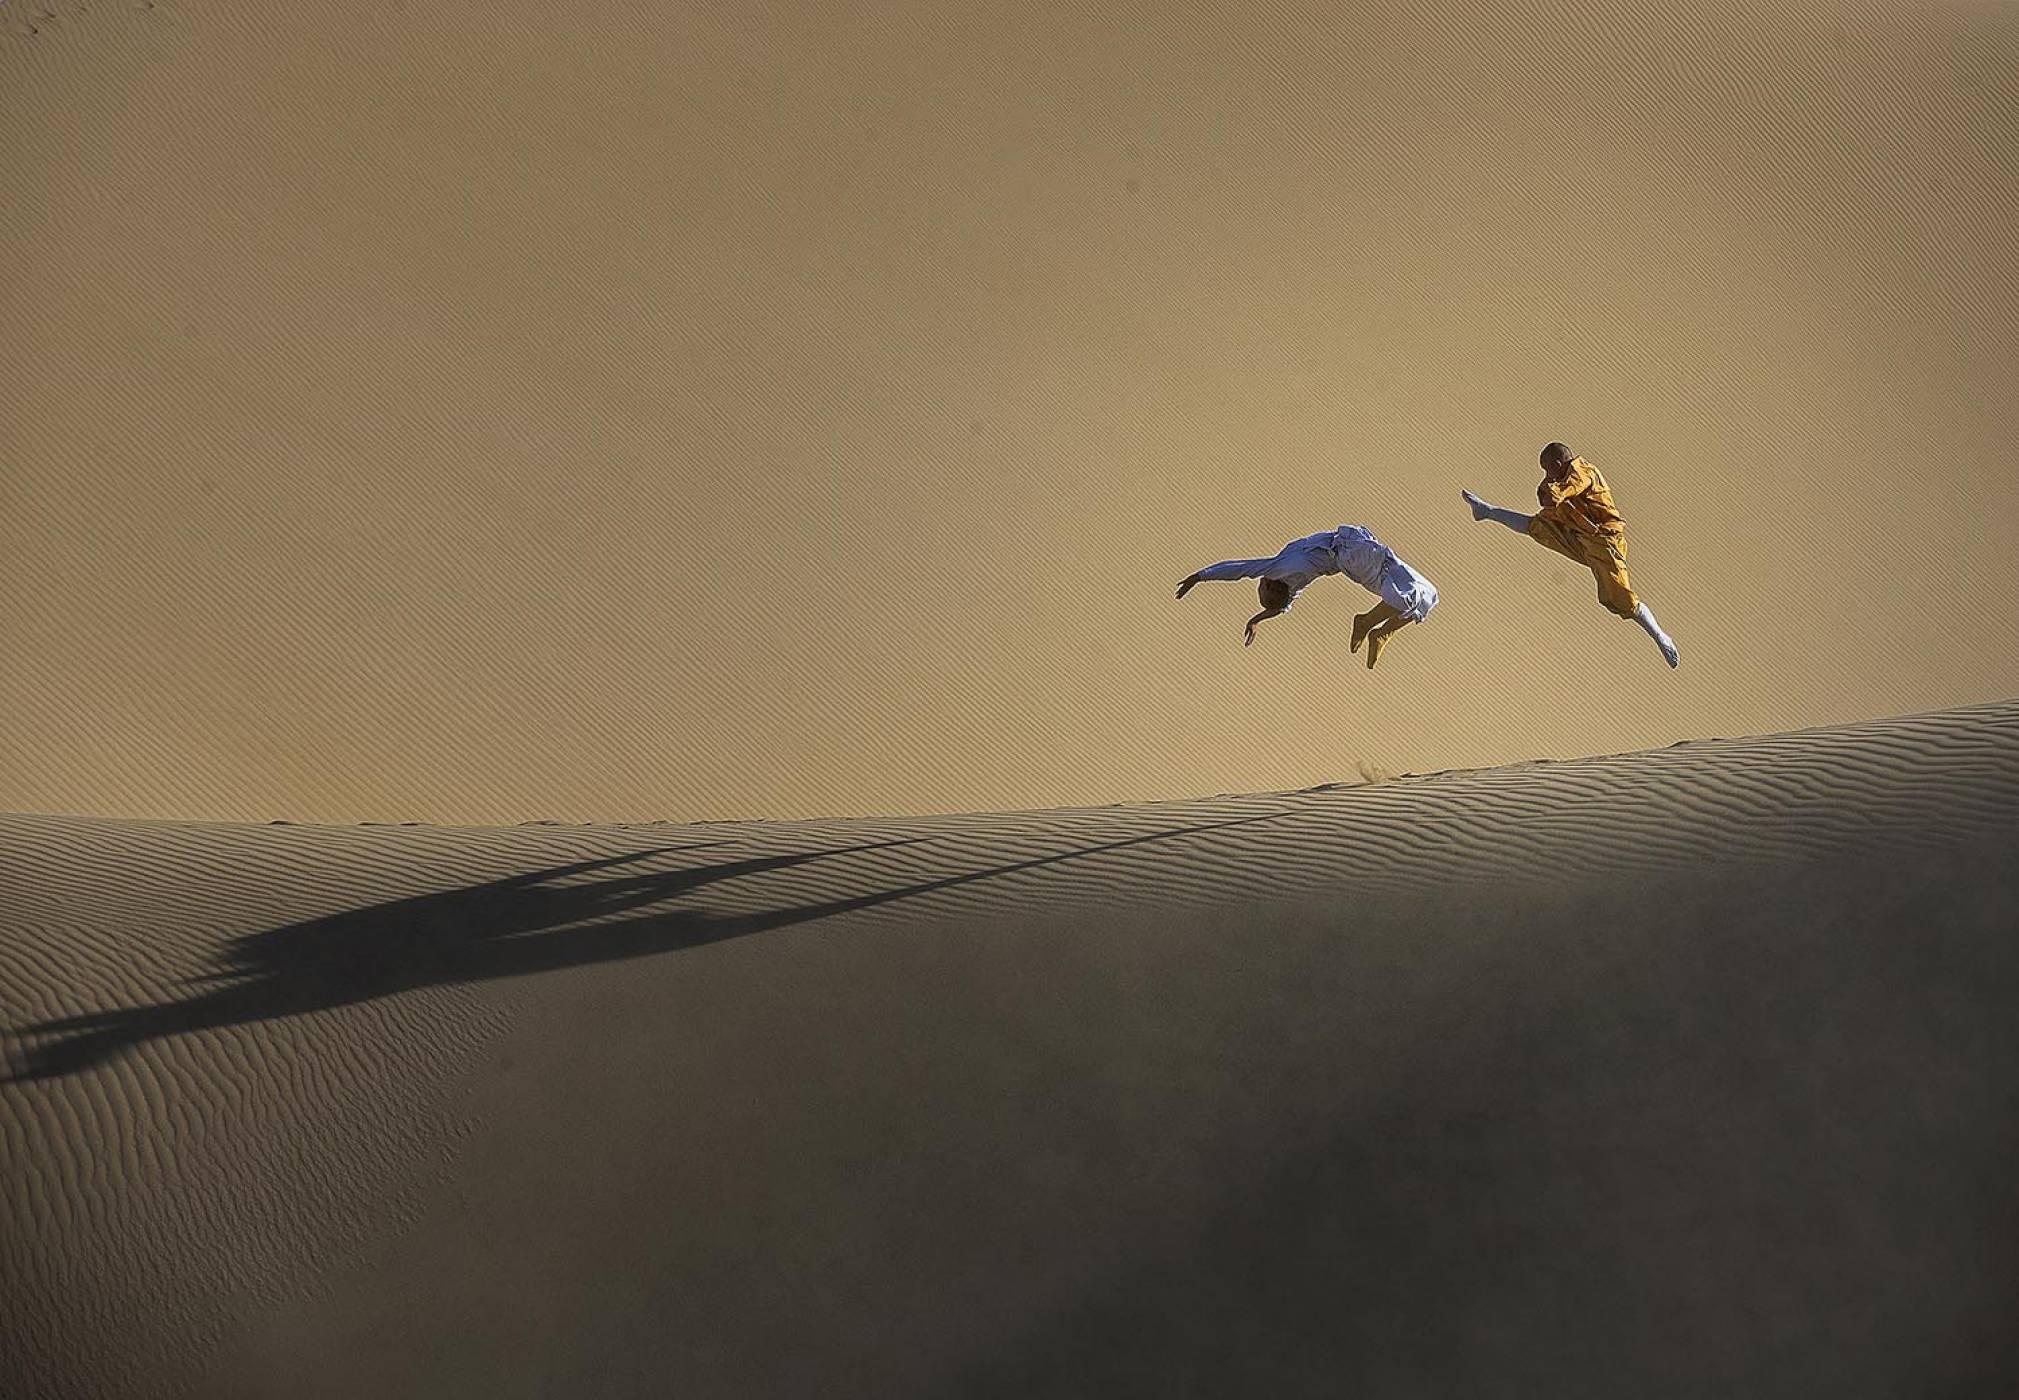 WPO Announces 2014 Sony World Photography Awards Shortlists